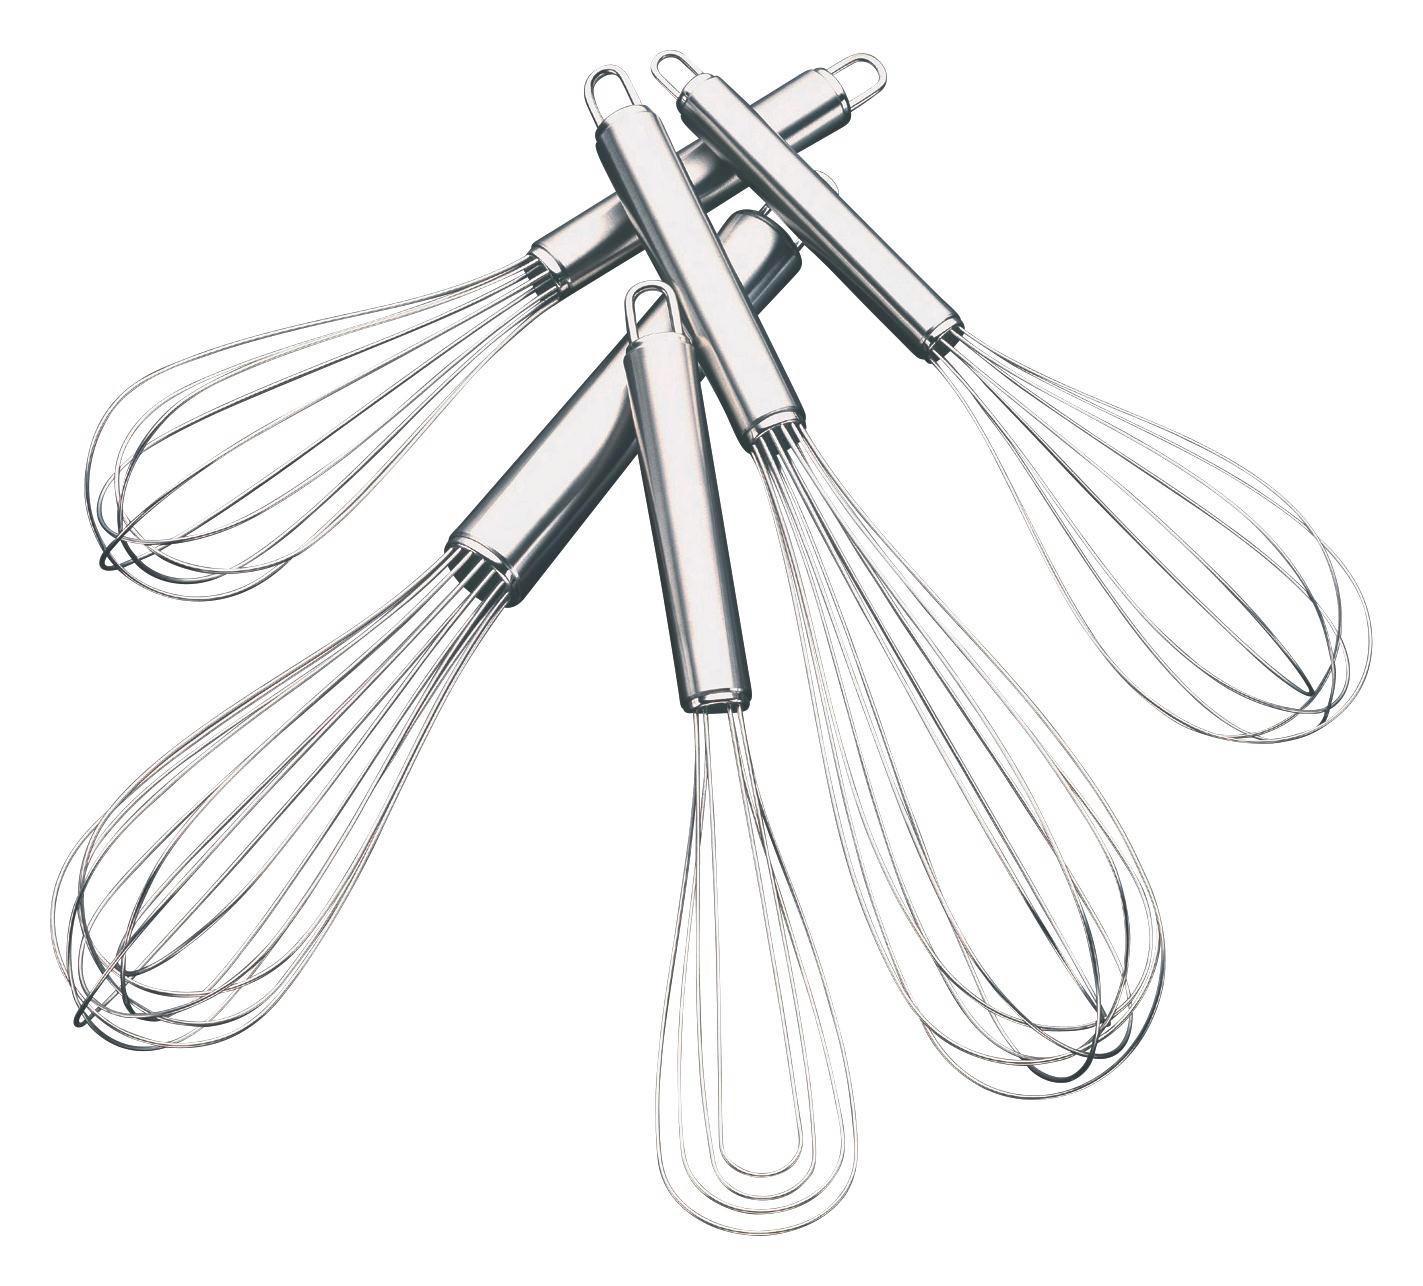 SCHNEEBESEN - Basics, Metall (30cm) - JUSTINUS